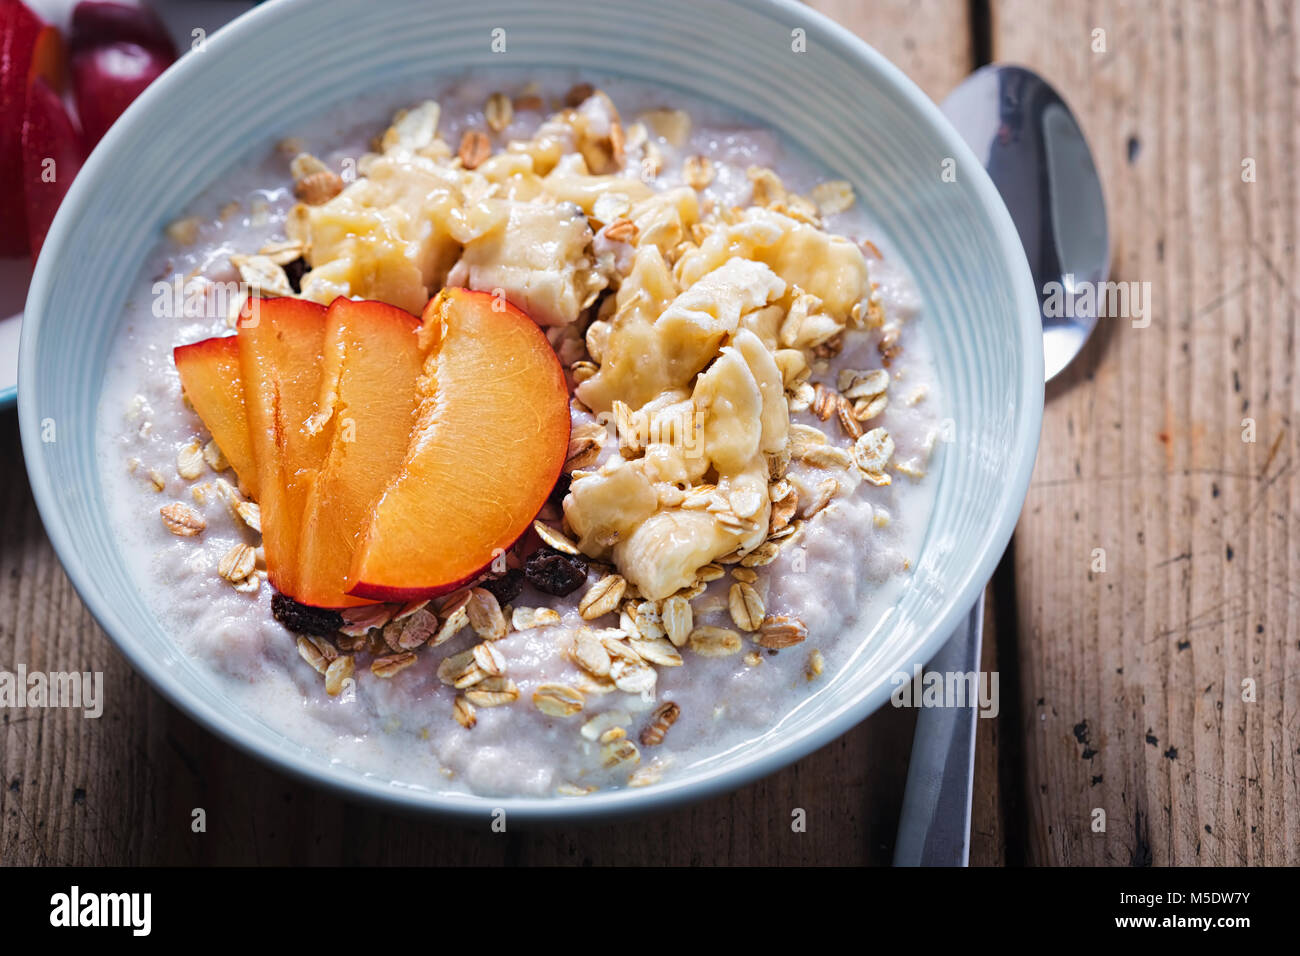 Strawberry porridge with oats, mashed banana and plum - Stock Image